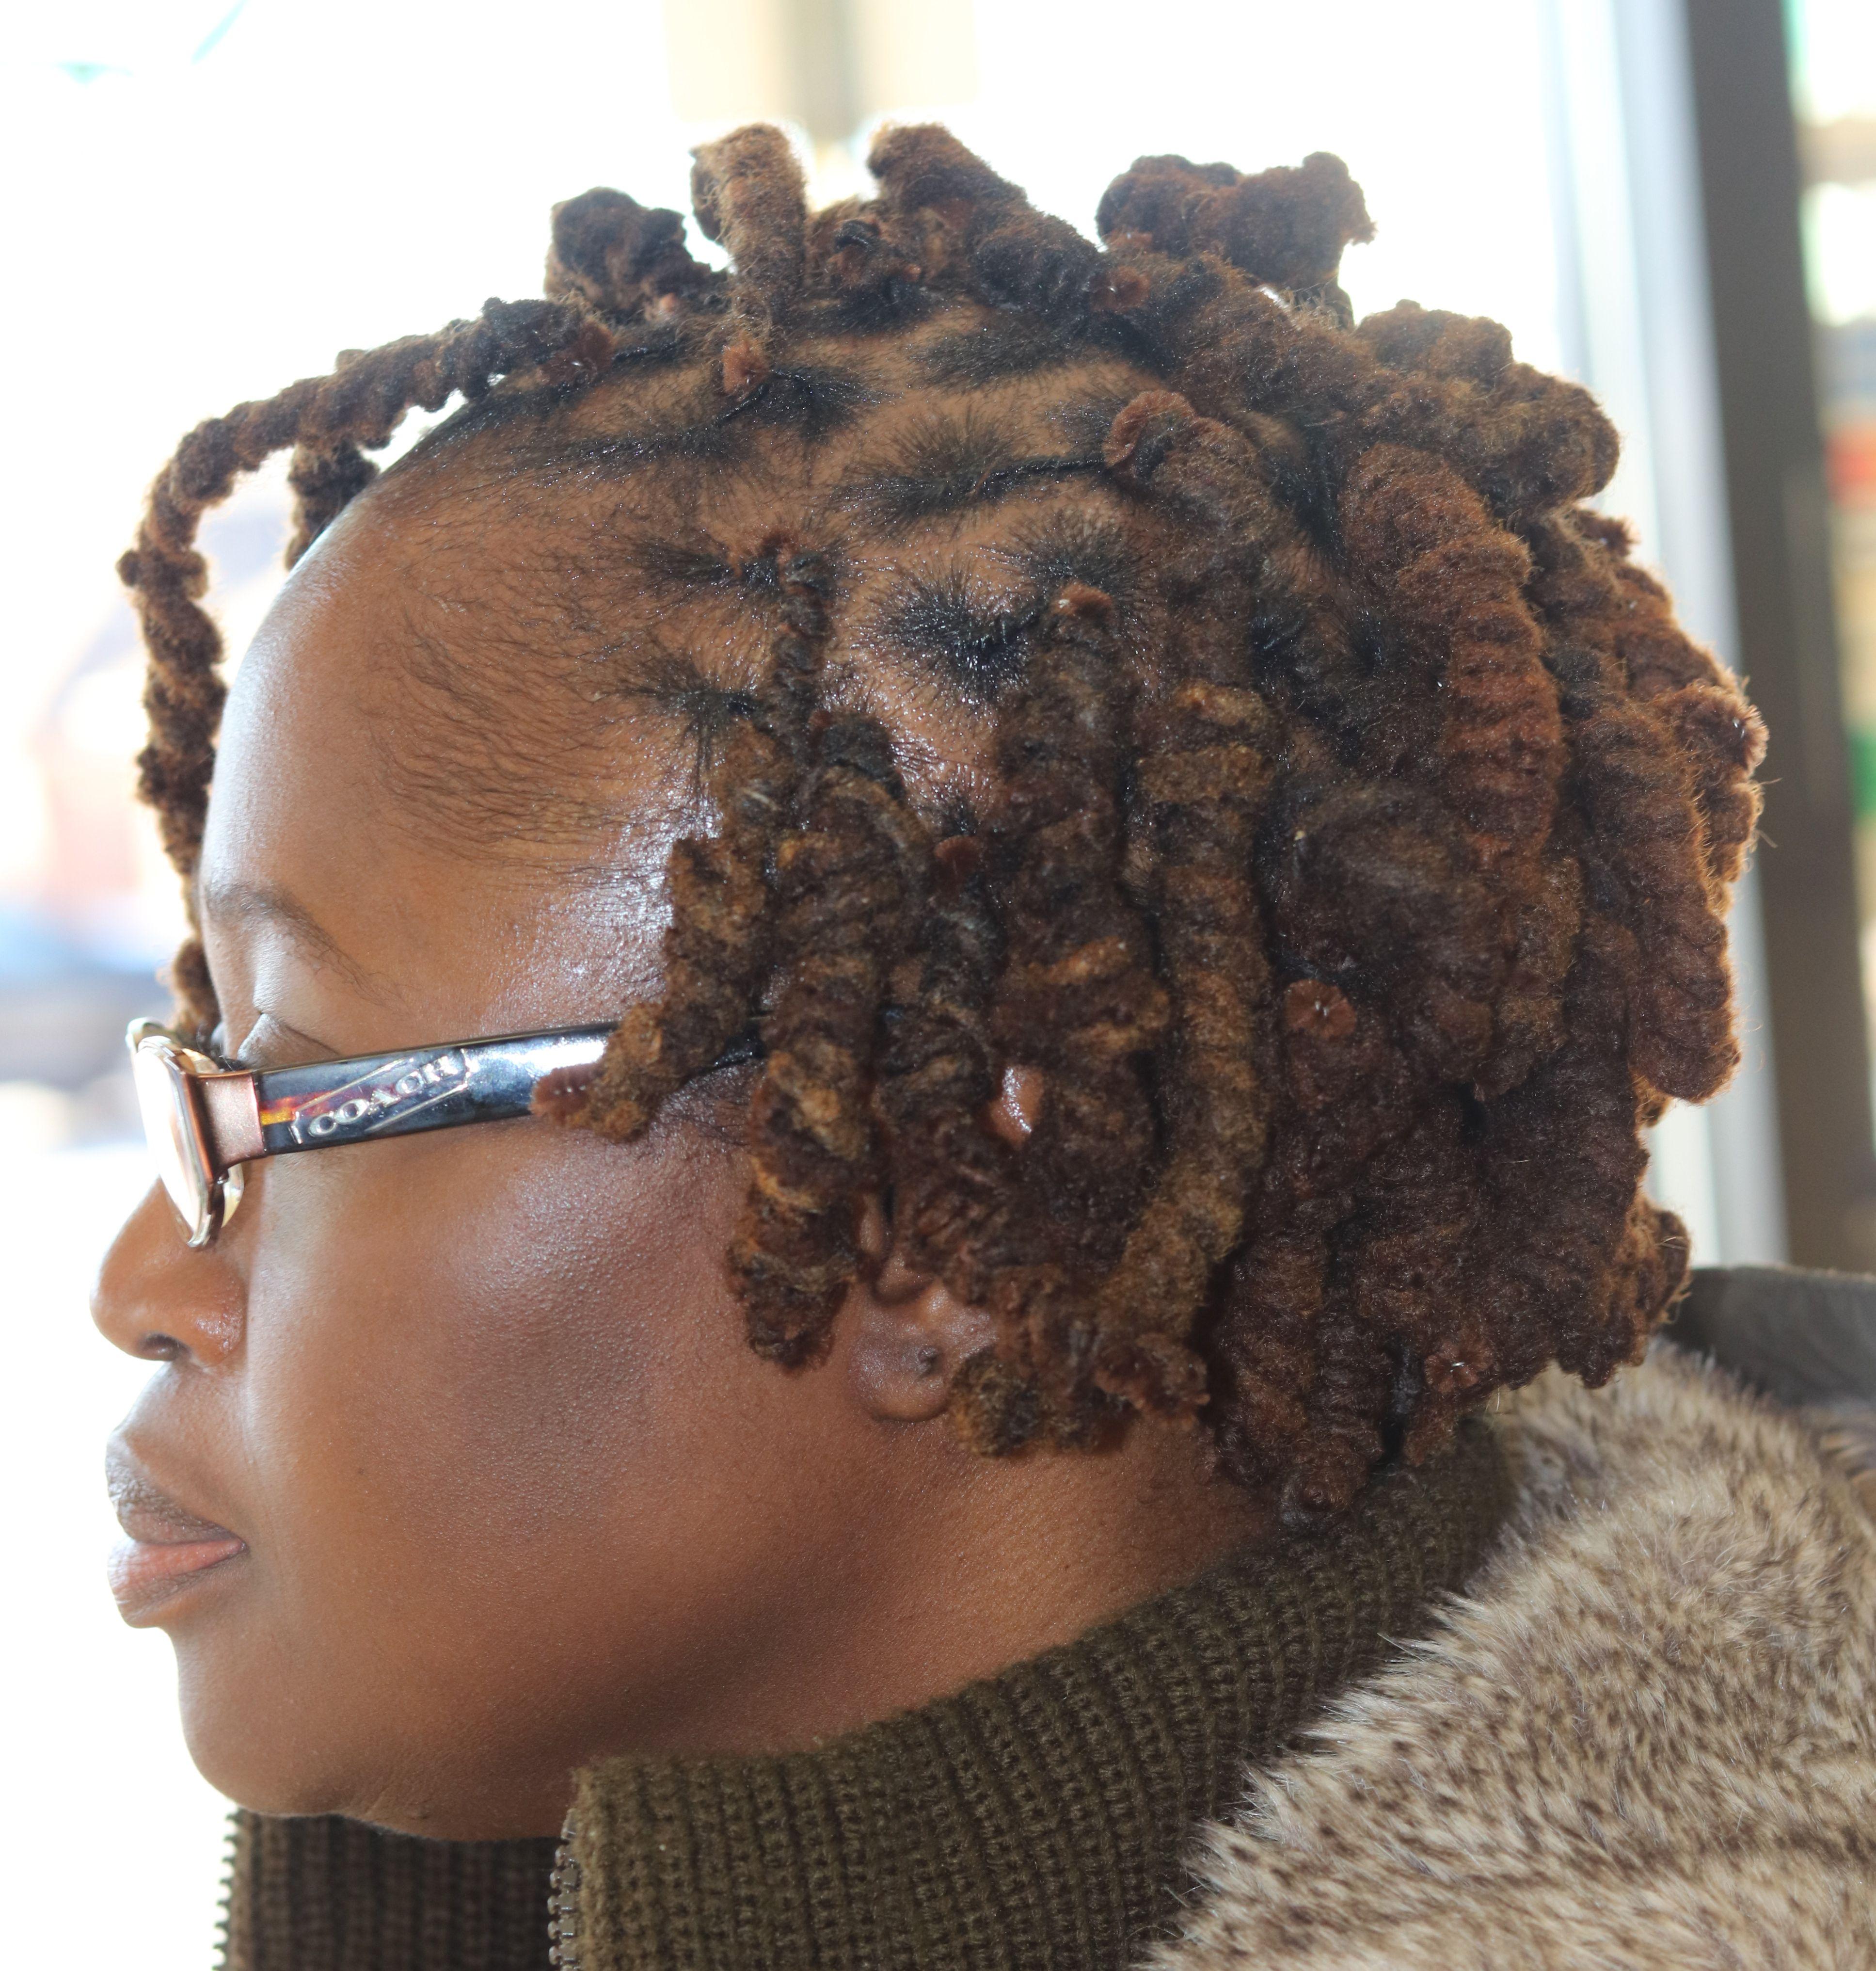 Dreadlocks Styled At Djea Natural Hair Spa In Conyers Ga Naturalhair Hair Natural Locs Loclif Natural Hair Salons Natural Hair Spa Natural Hair Styles